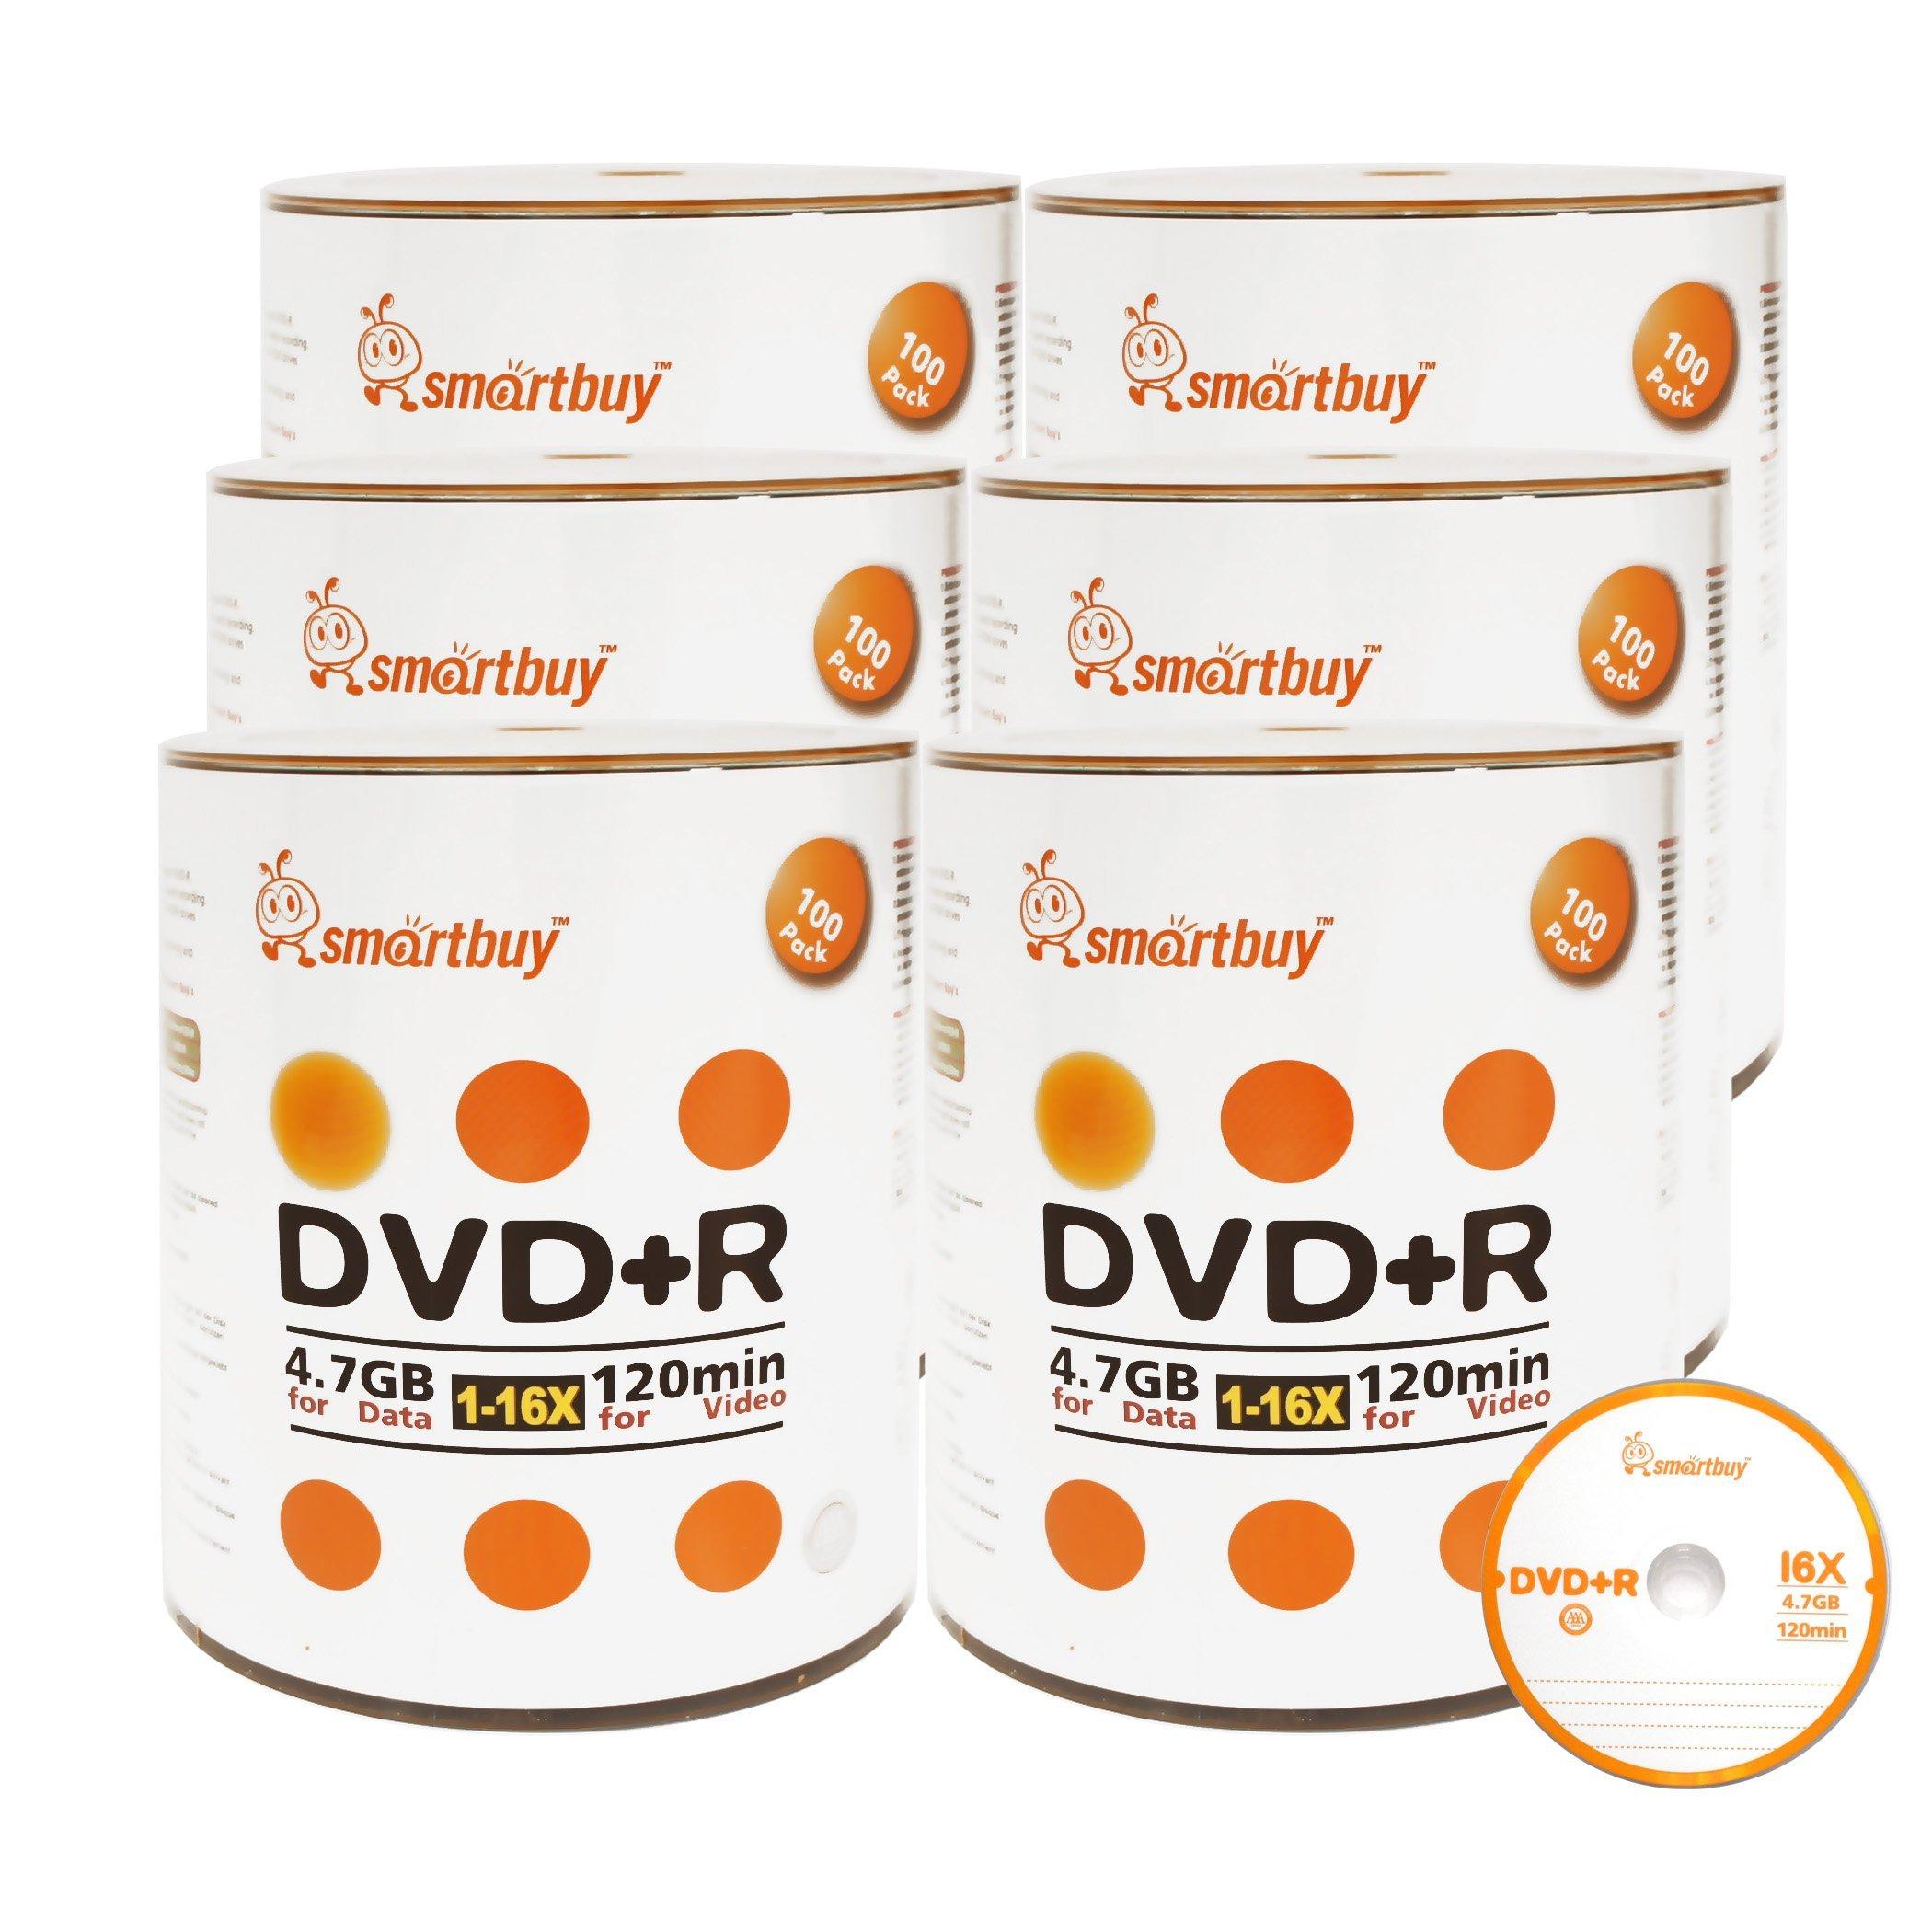 Smartbuy 4.7gb/120min 16x DVD+R Logo Top Blank Data Video Recordable Media Disc (600-Disc)